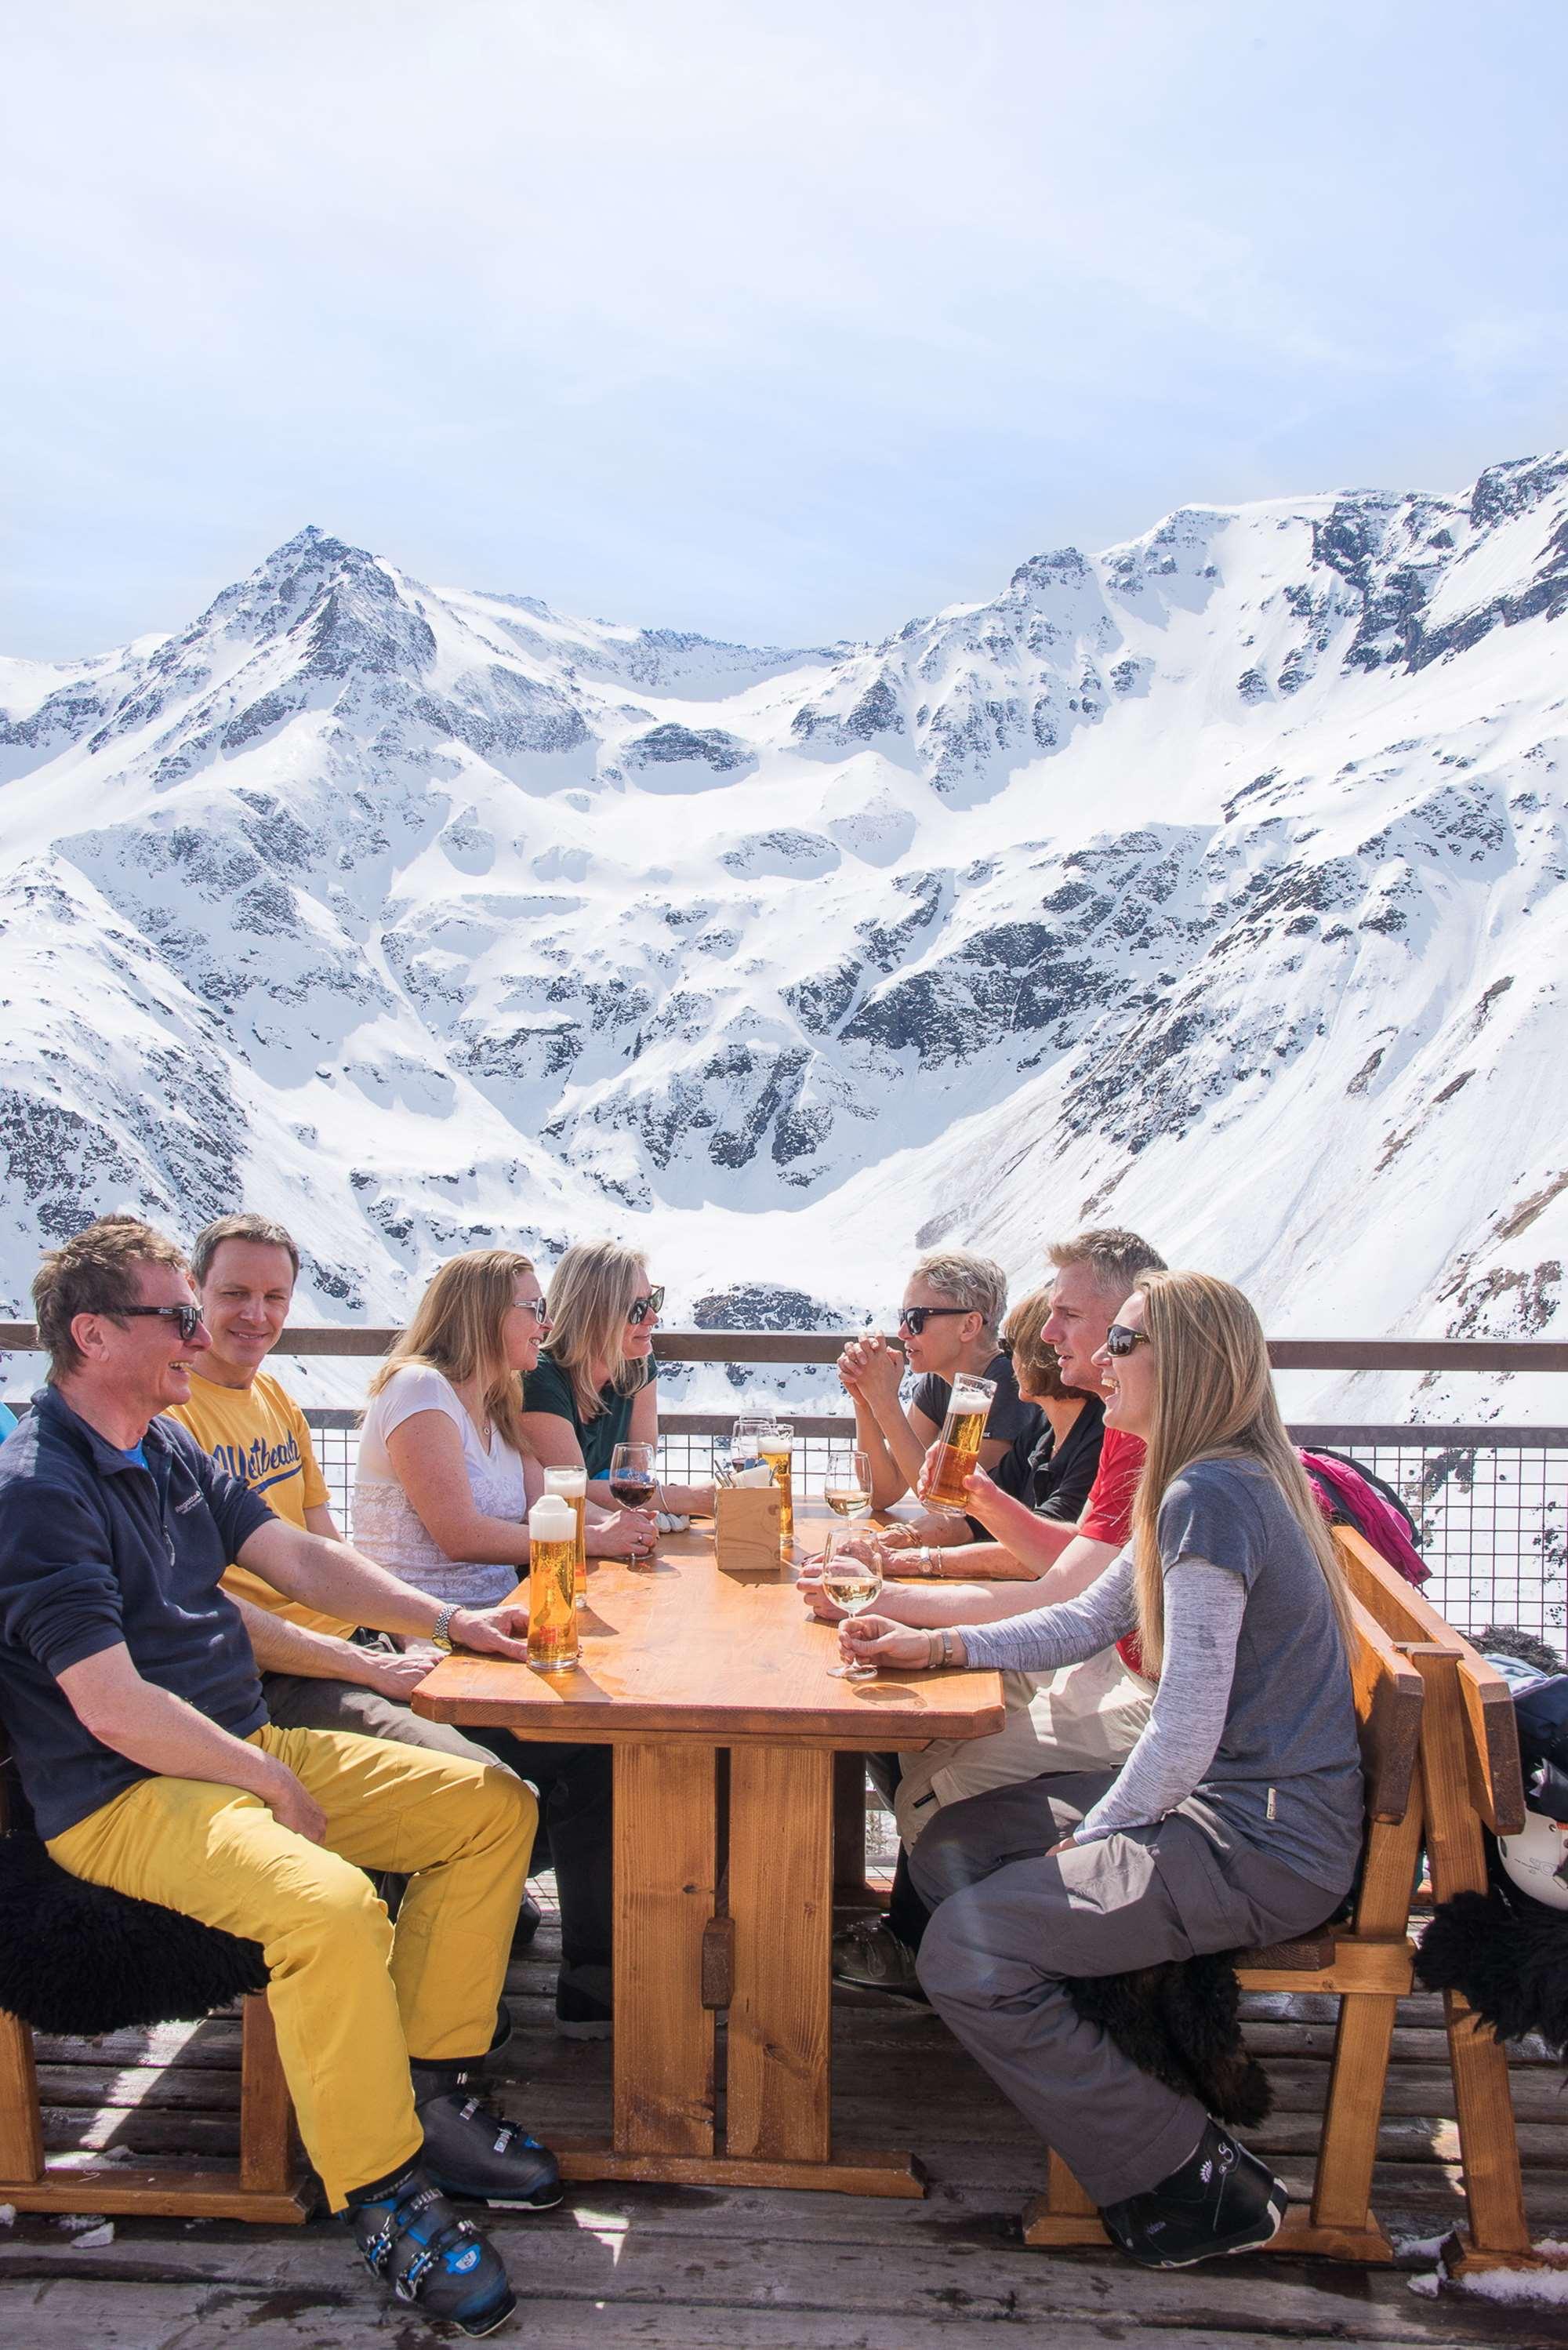 Drinks on the mountain at Sportgastein